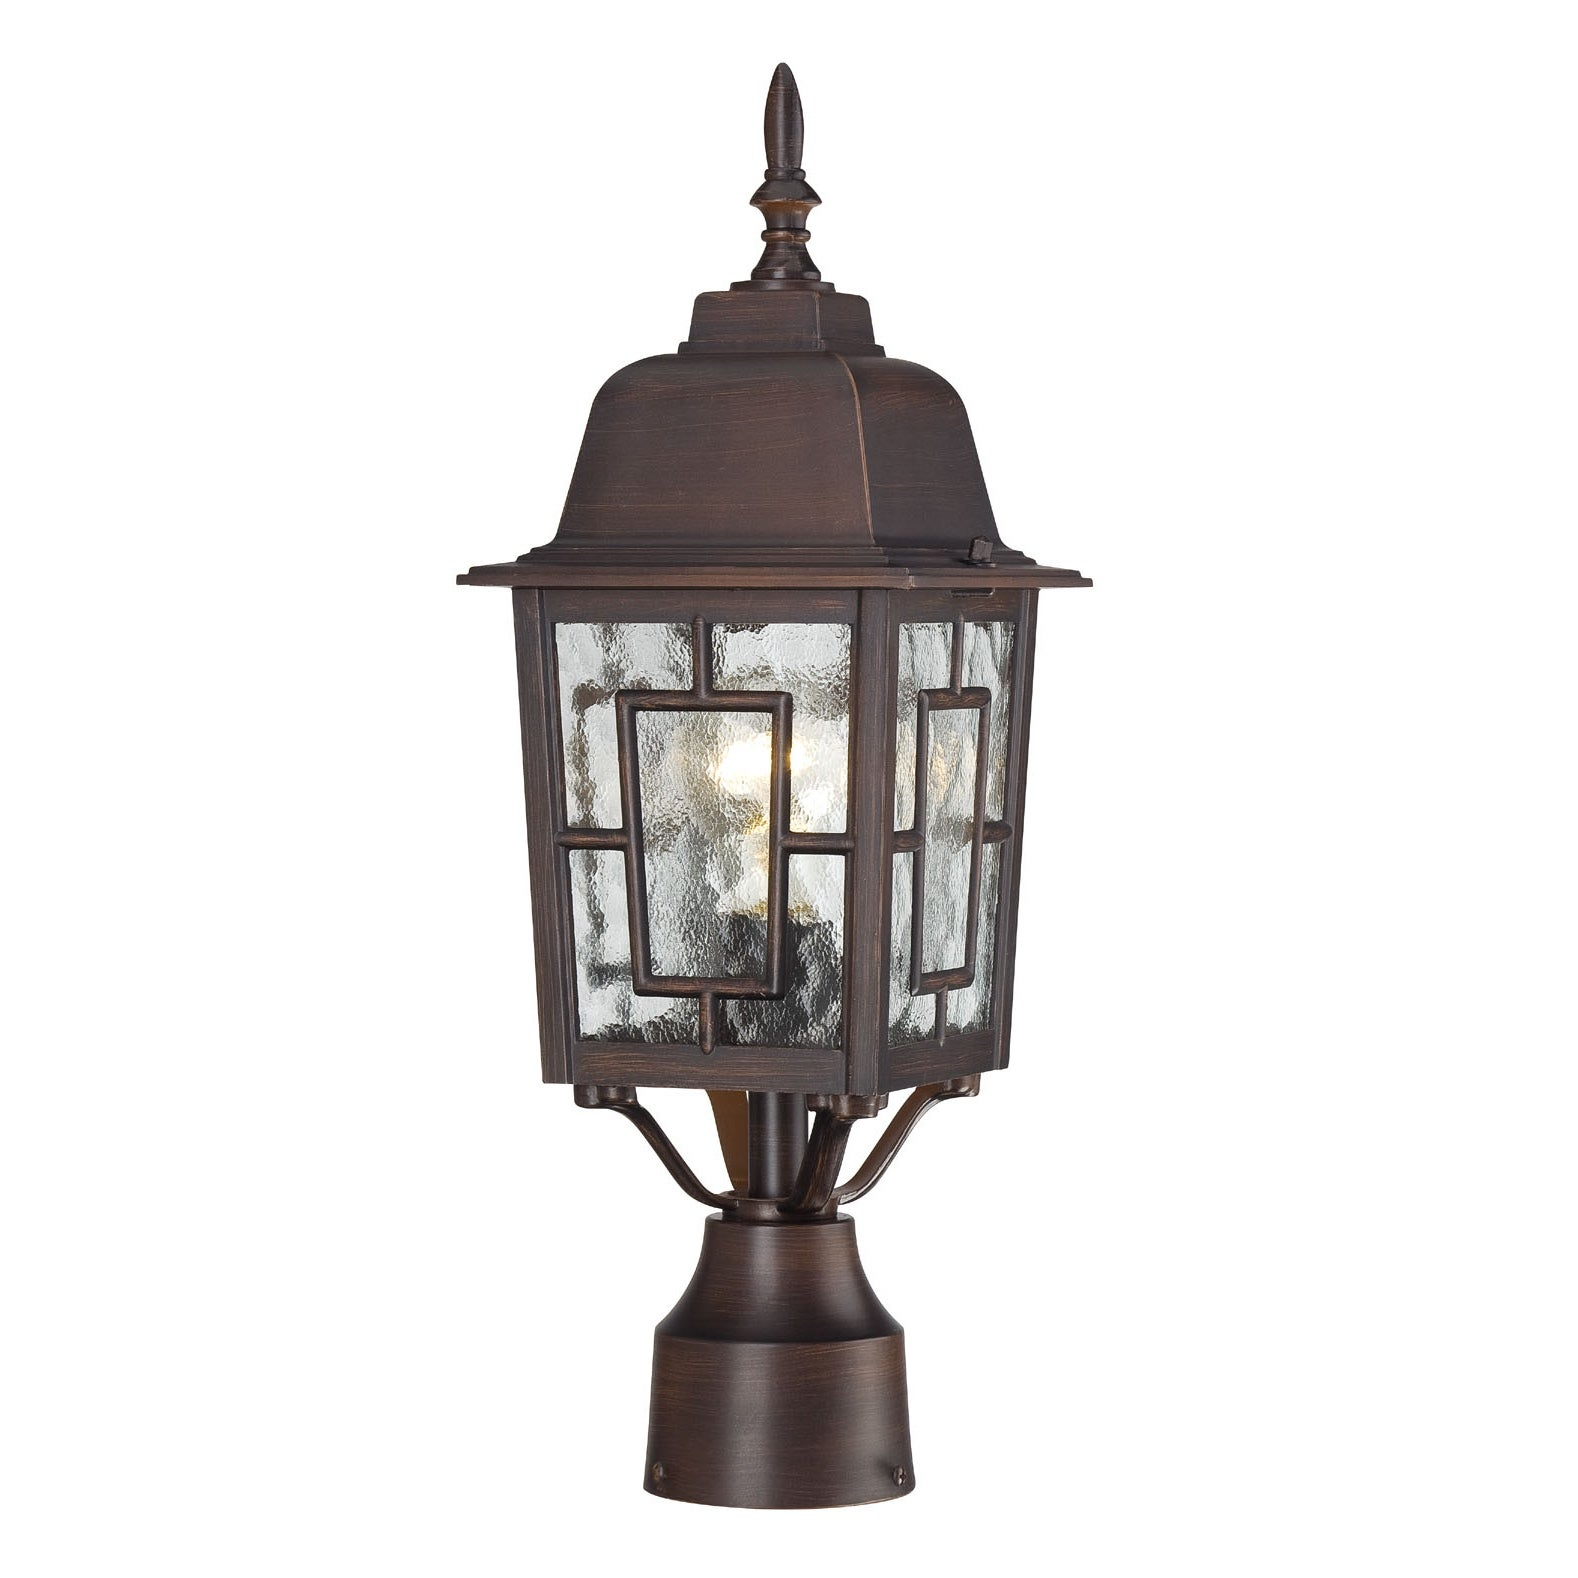 Discount Light Fixture: Nuvo Banyon 1-light Rustic Bronze 17-inch Post Fixture